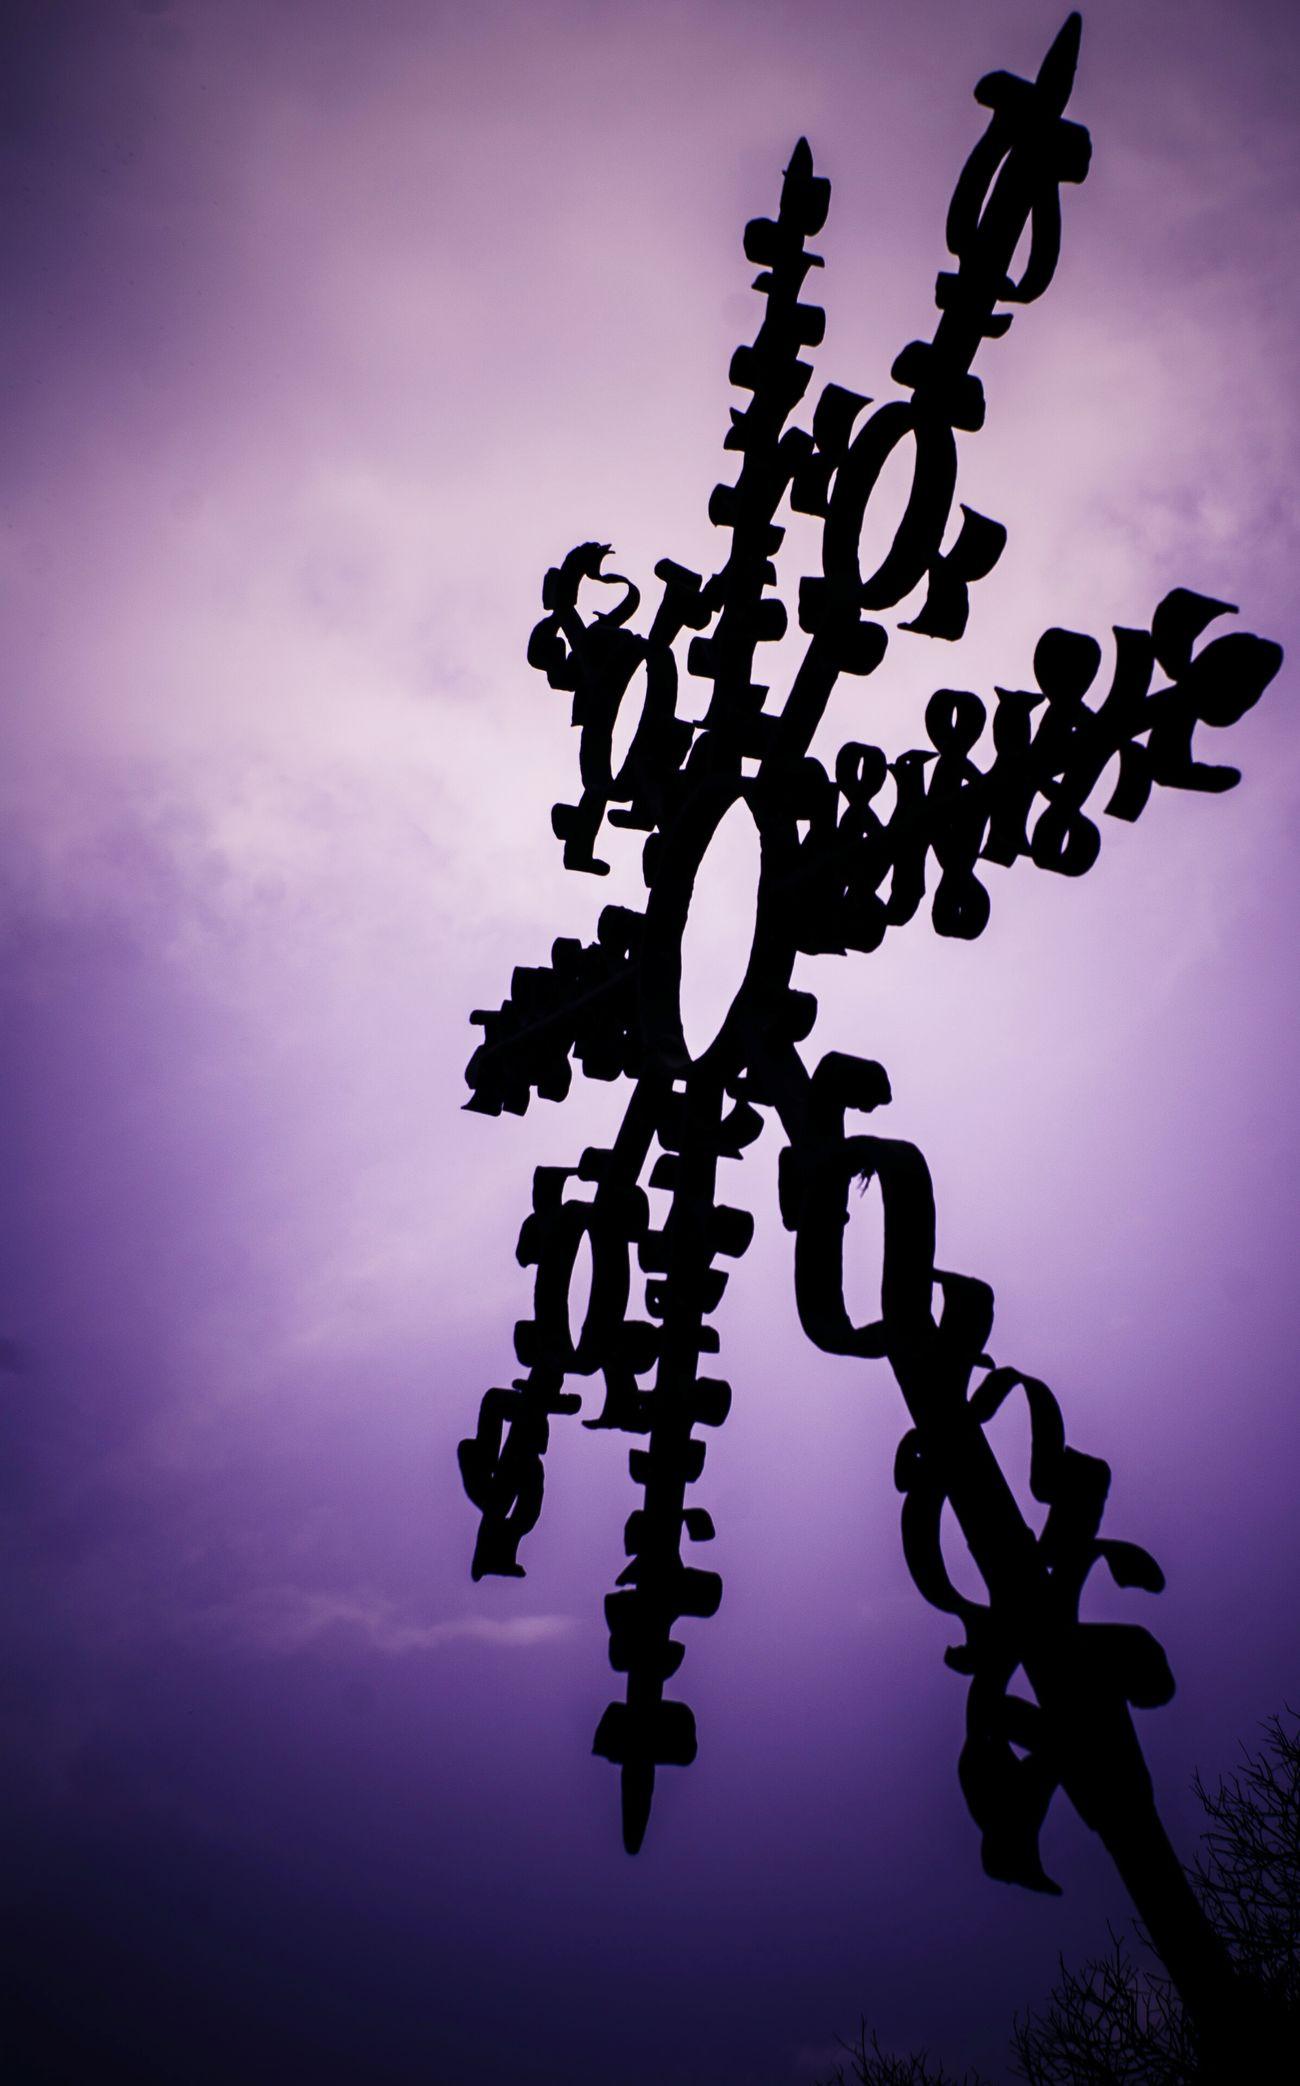 Purple Sky Utopic Unicorn San Angel Mexico City Fotowalk